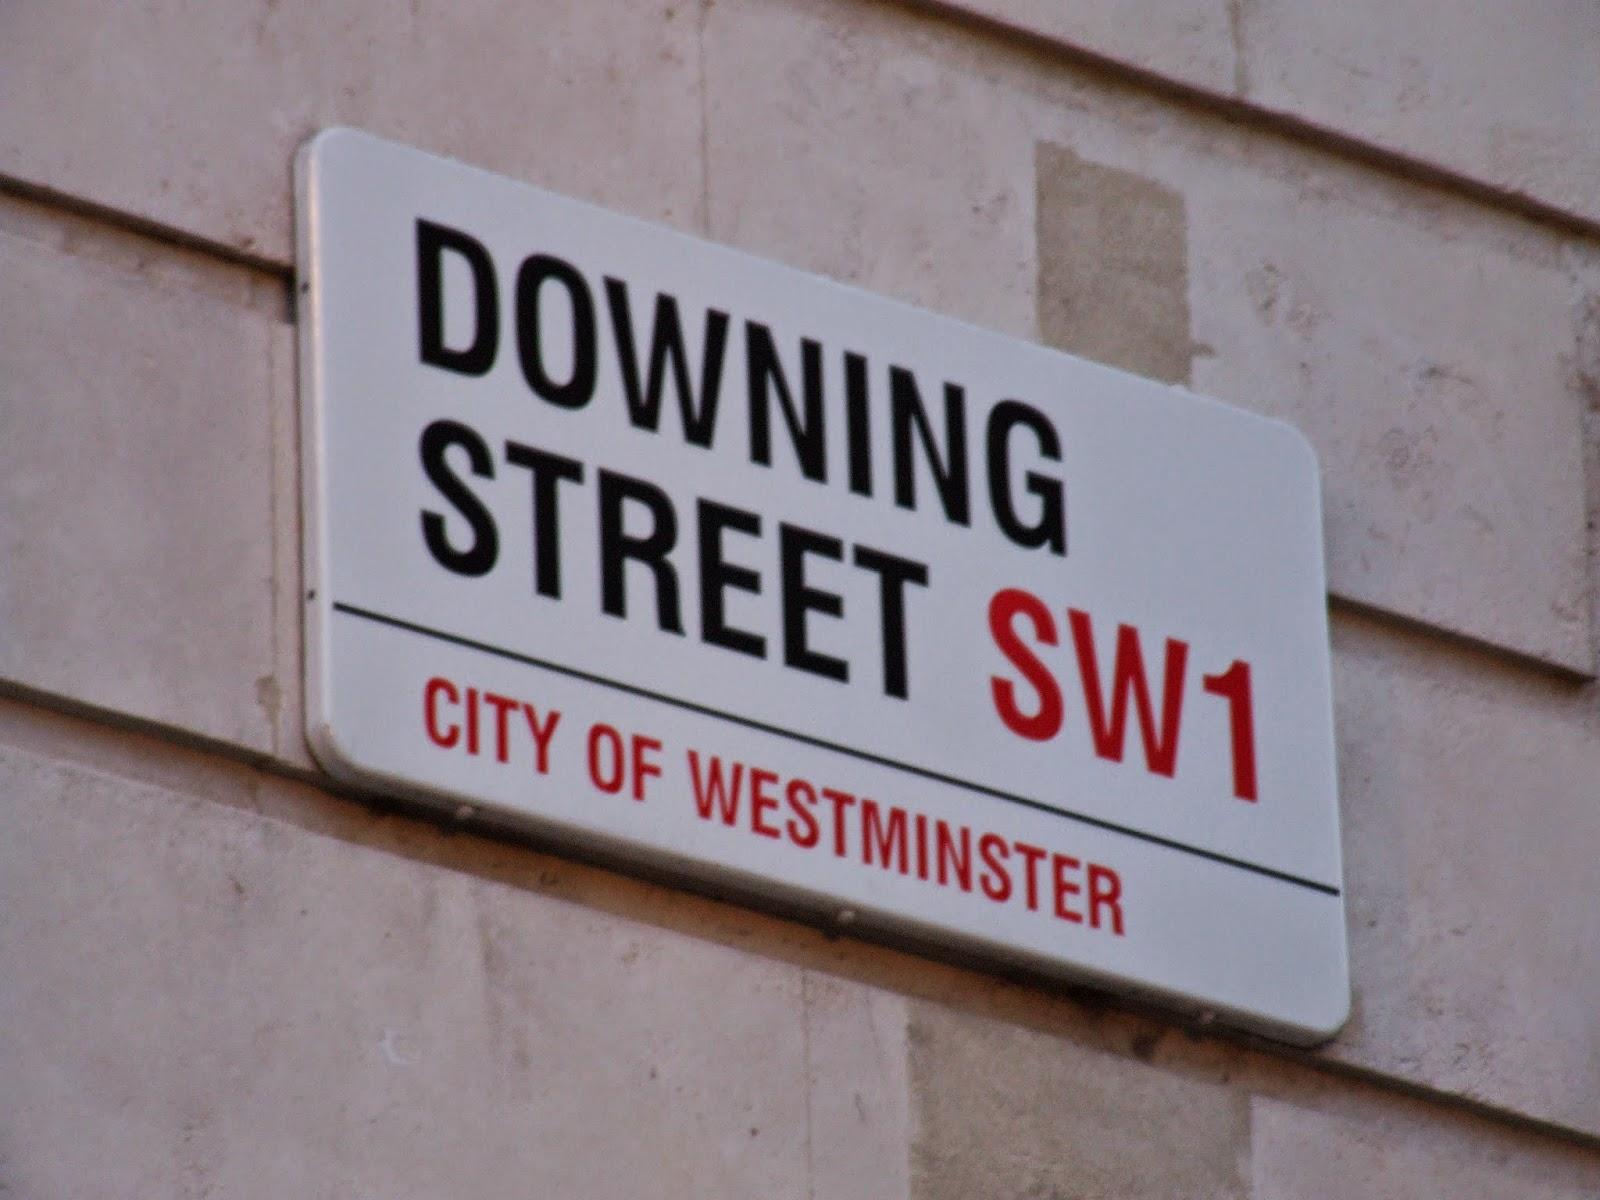 Downing Street.